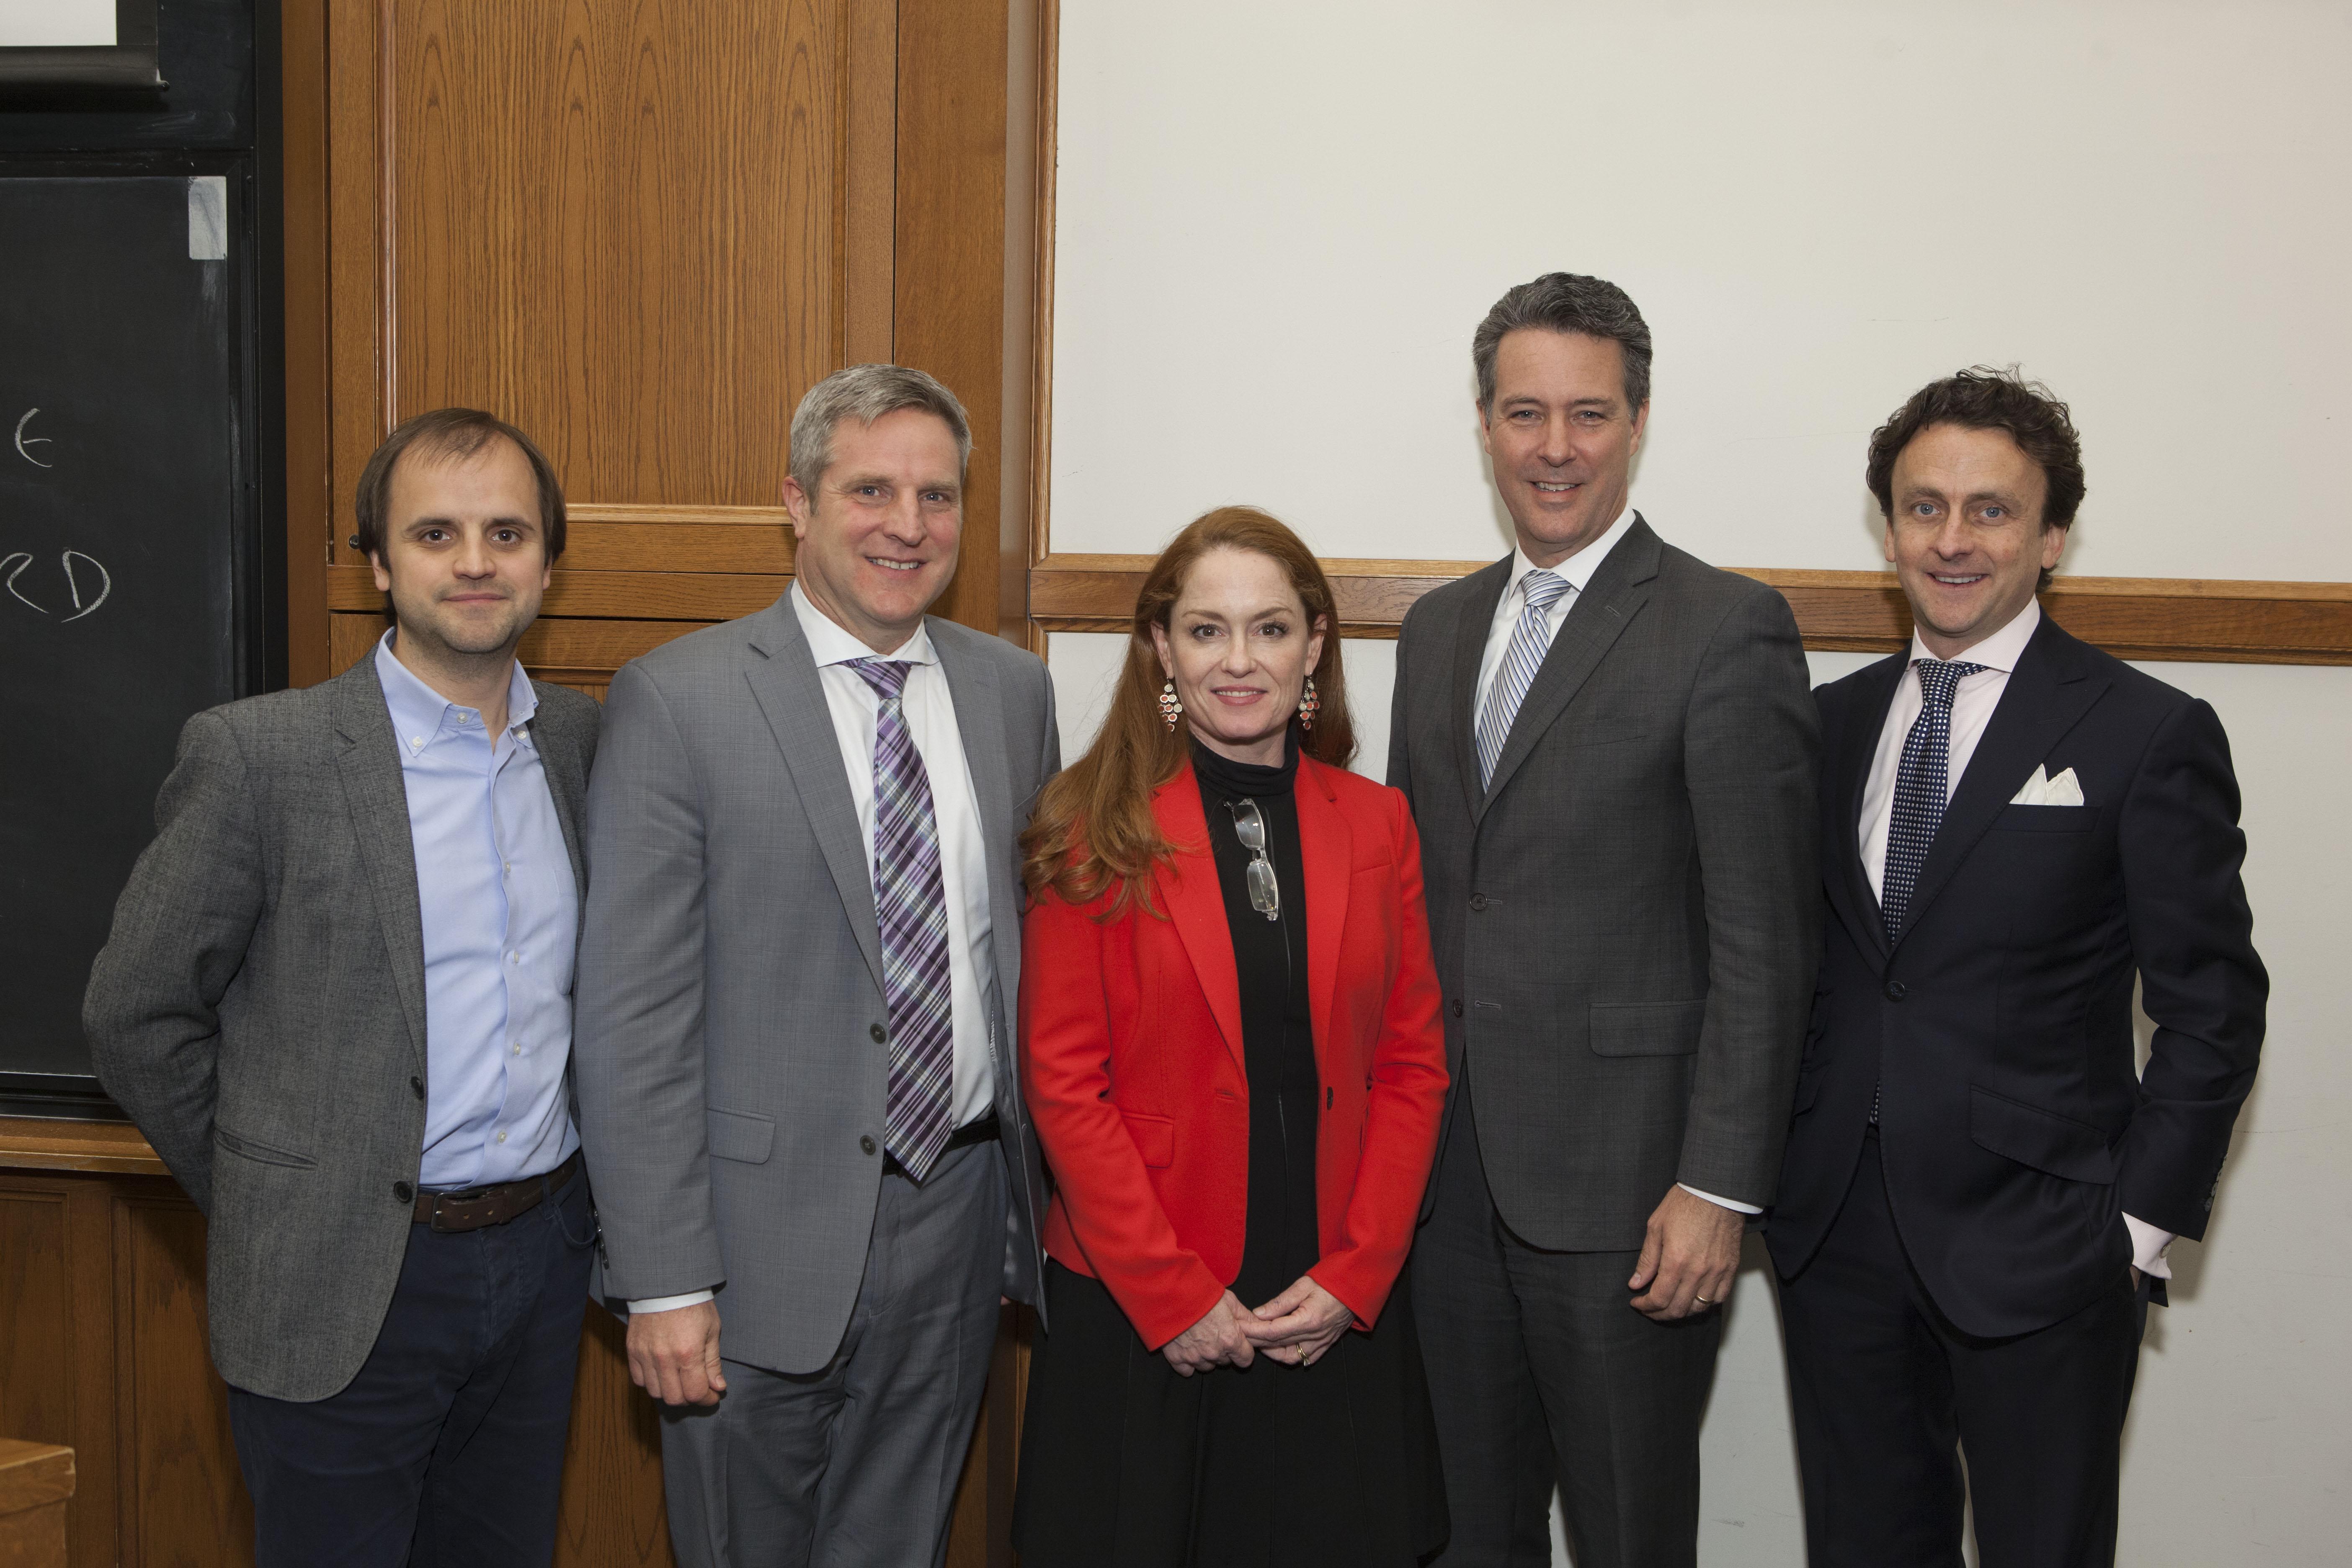 MIT Sloan Prof. Christian Catalini, U. of Toronto Rotman Prof. Alexander Dyck, Nina Kilbride, Scott O'Malia, and Charley Cooper